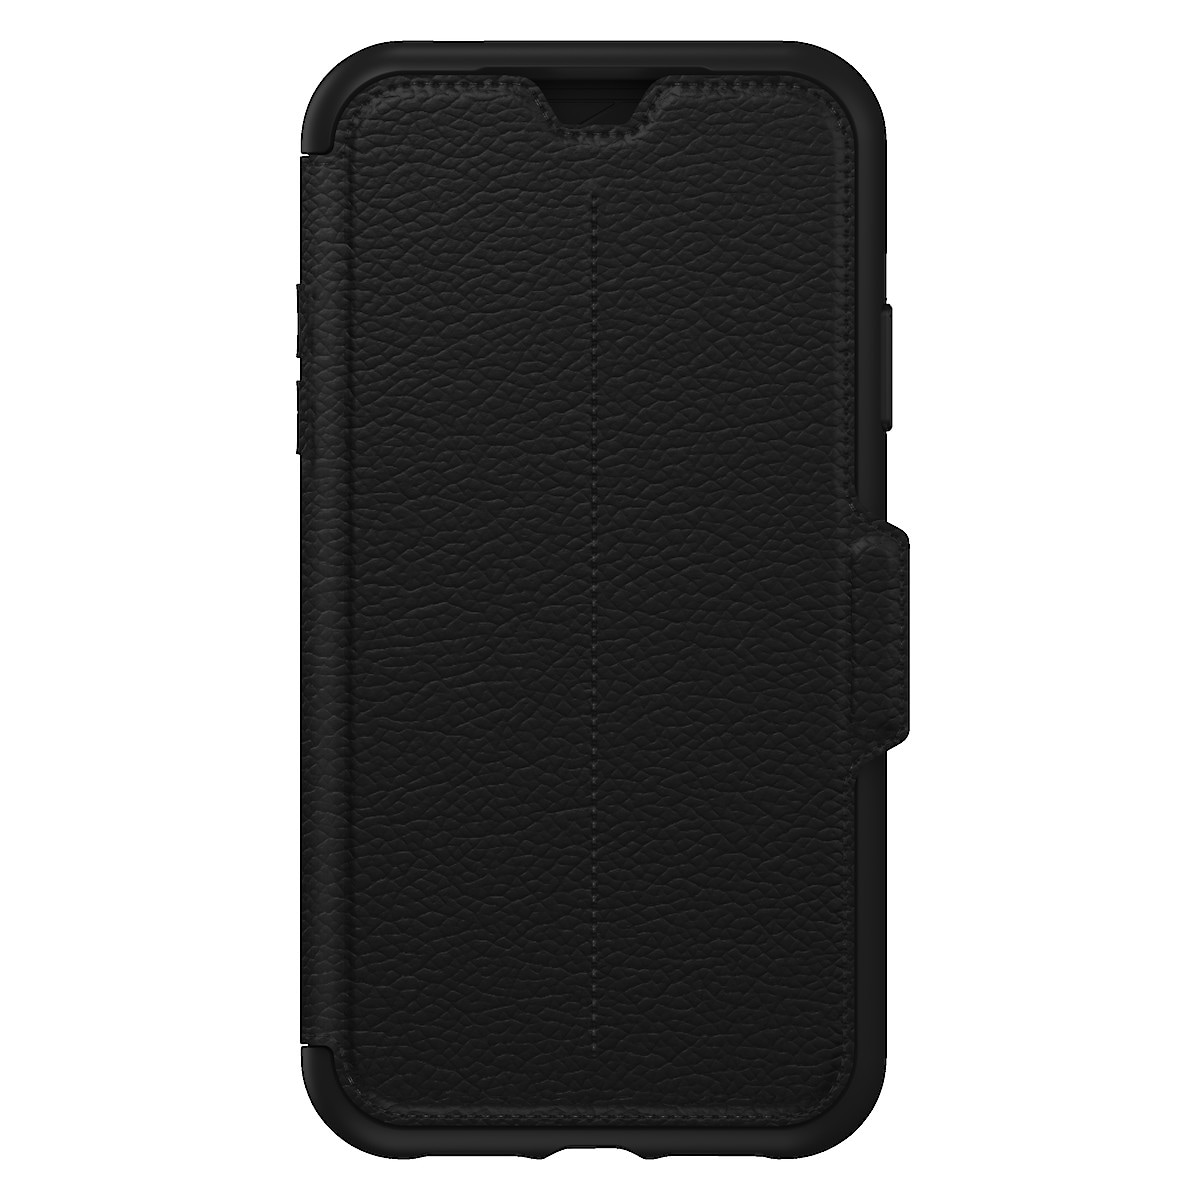 Plånboksfodral för iPhone XR Otterbox Strada